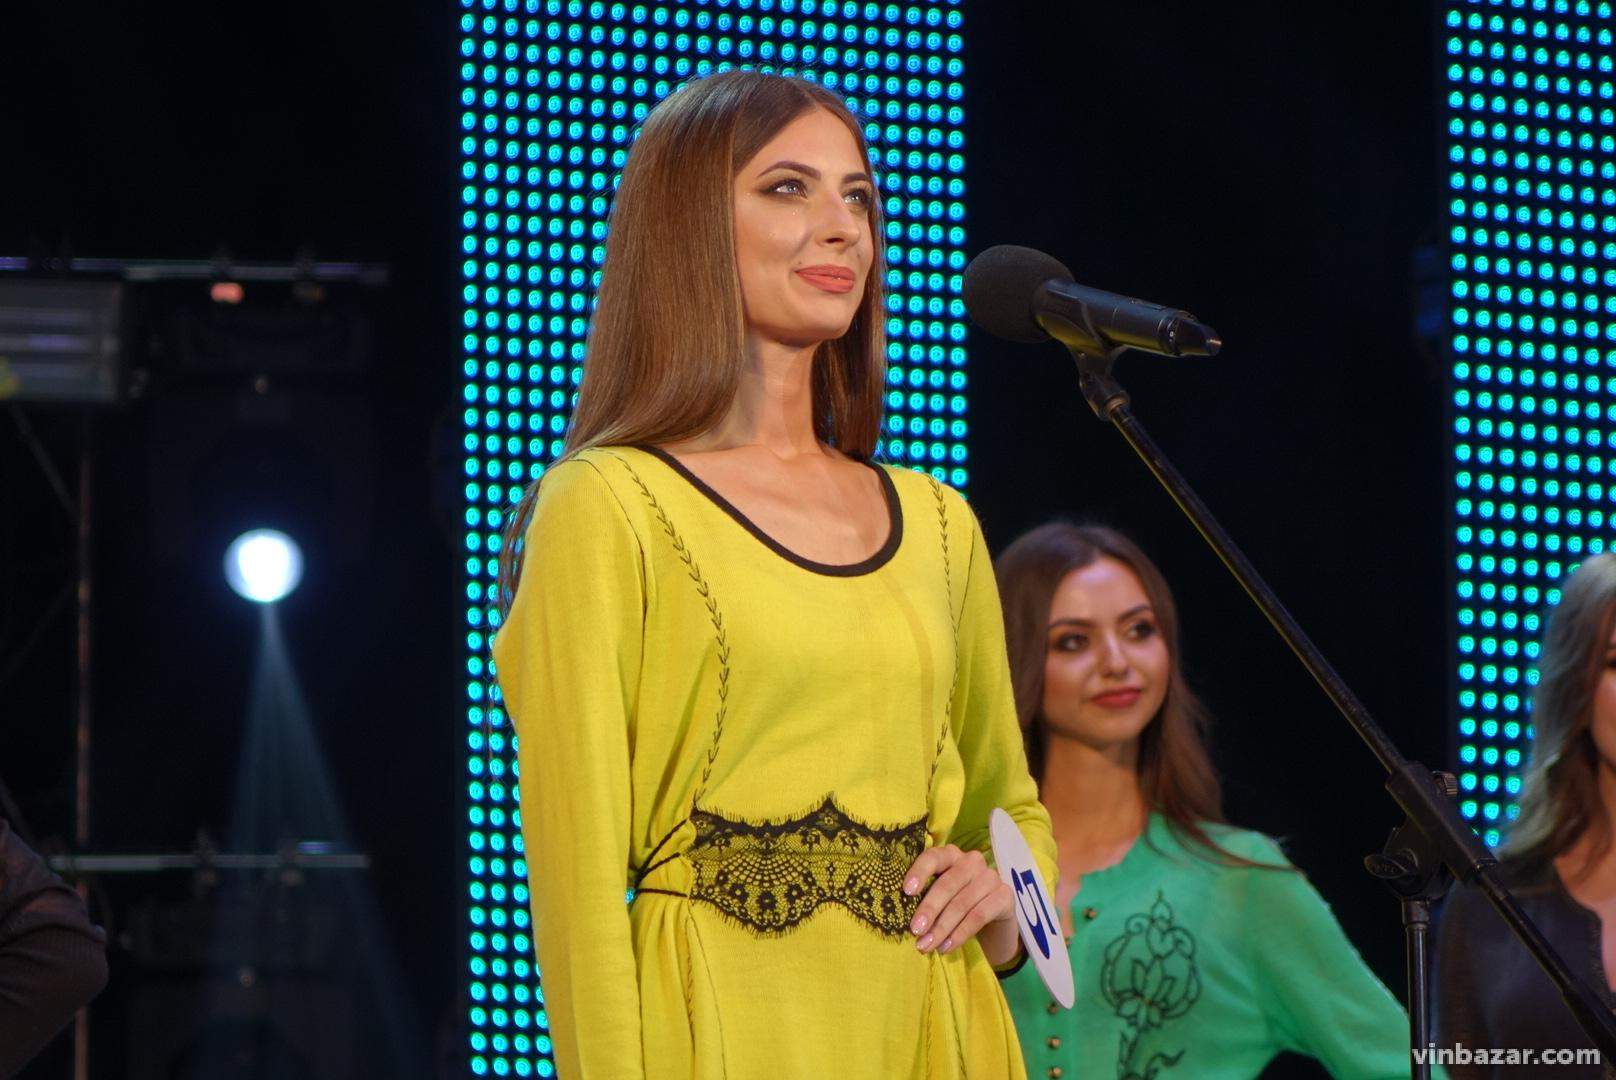 Фінал конкурсу краси